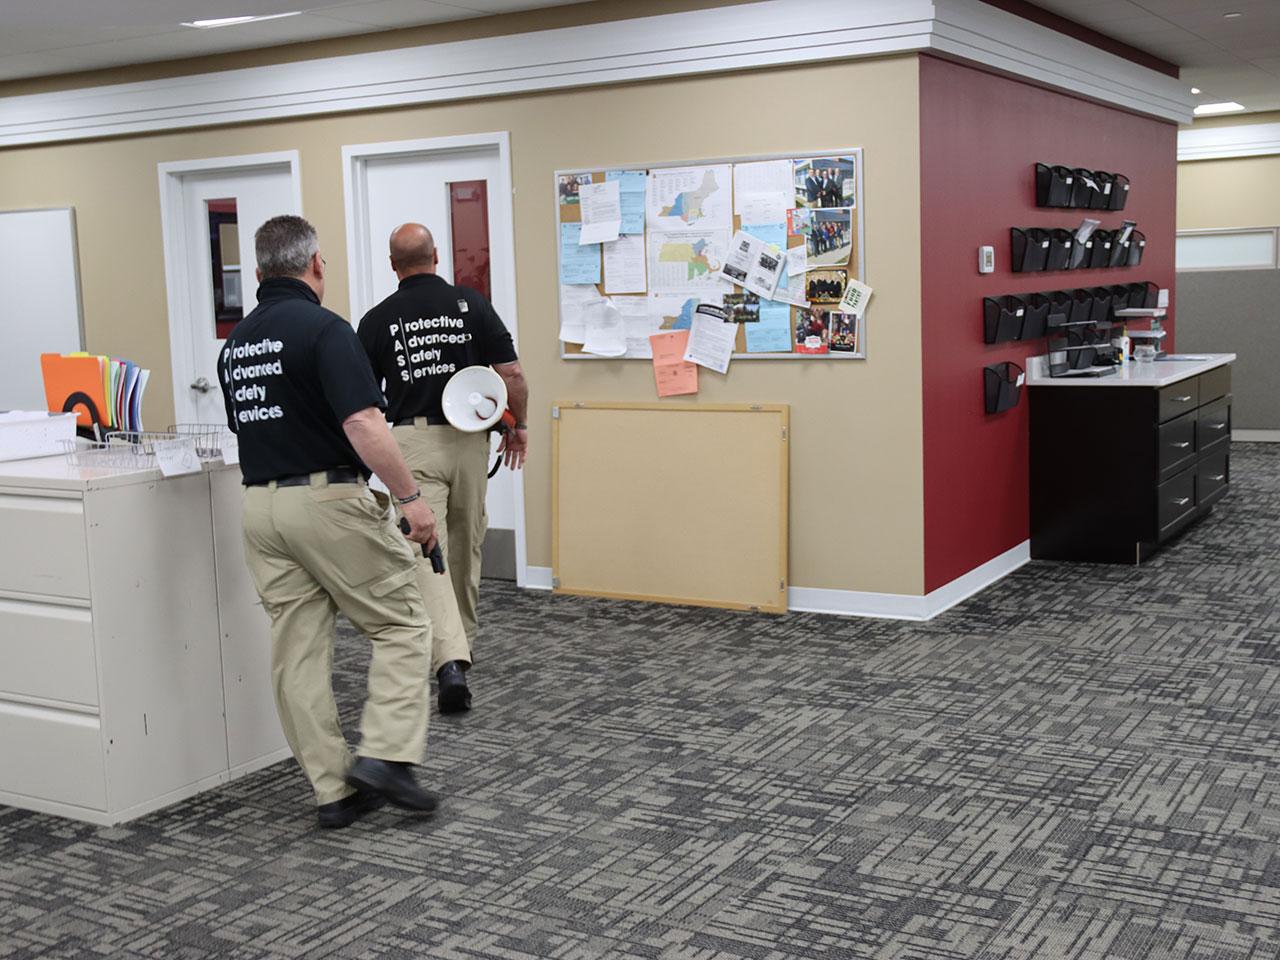 active shooter training running in halls